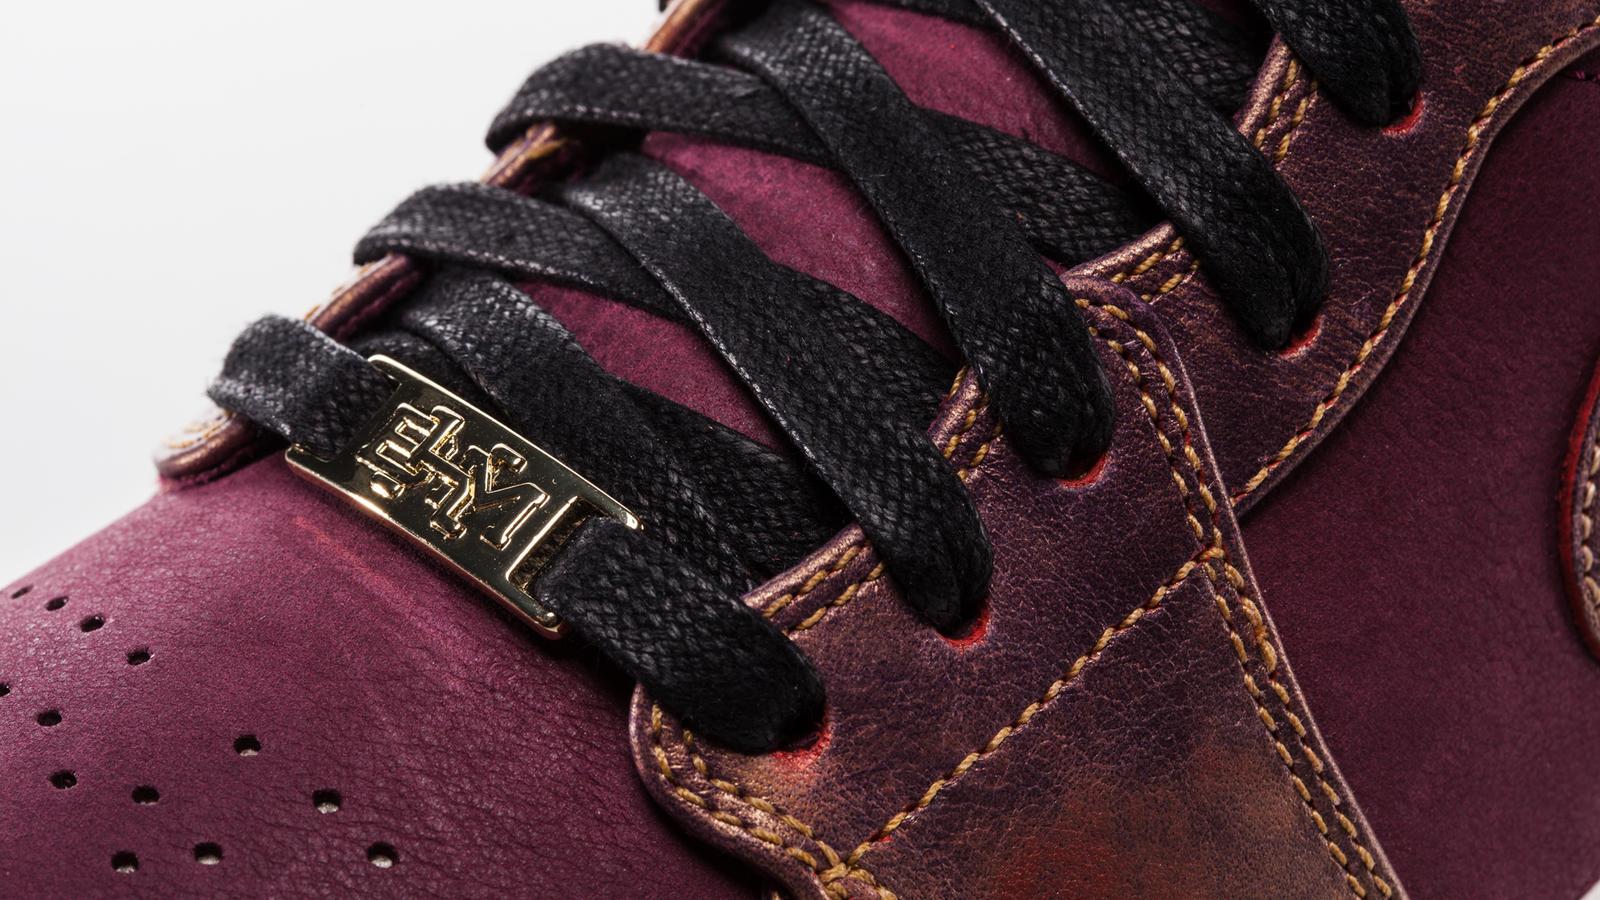 2014 BHM Collection Celebrates Sport Royalty Nike News